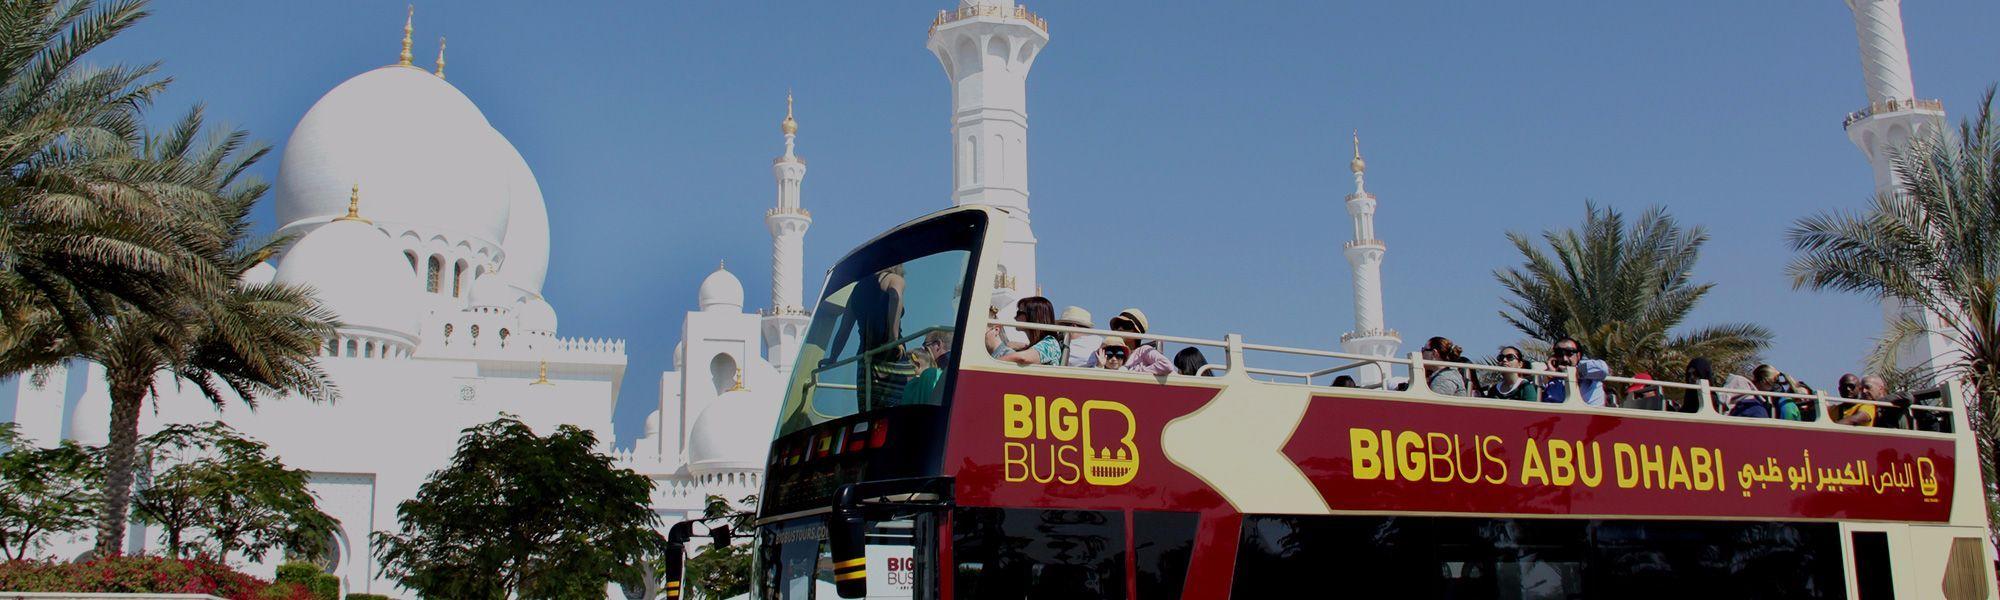 Muscat Muscat & Abu Dhabi Combo